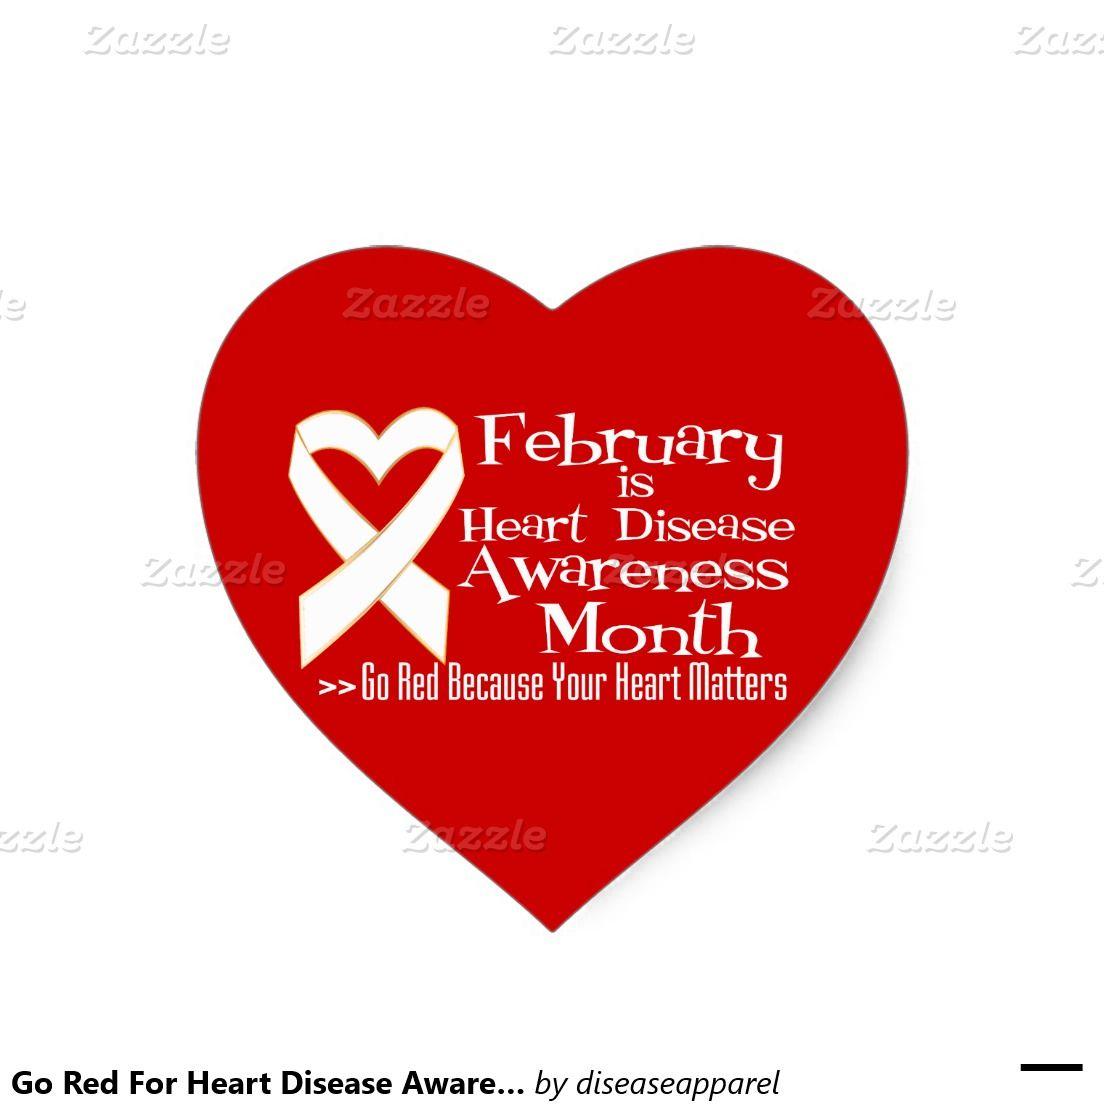 Go Red For Heart Disease Awareness Month Heart Sticker